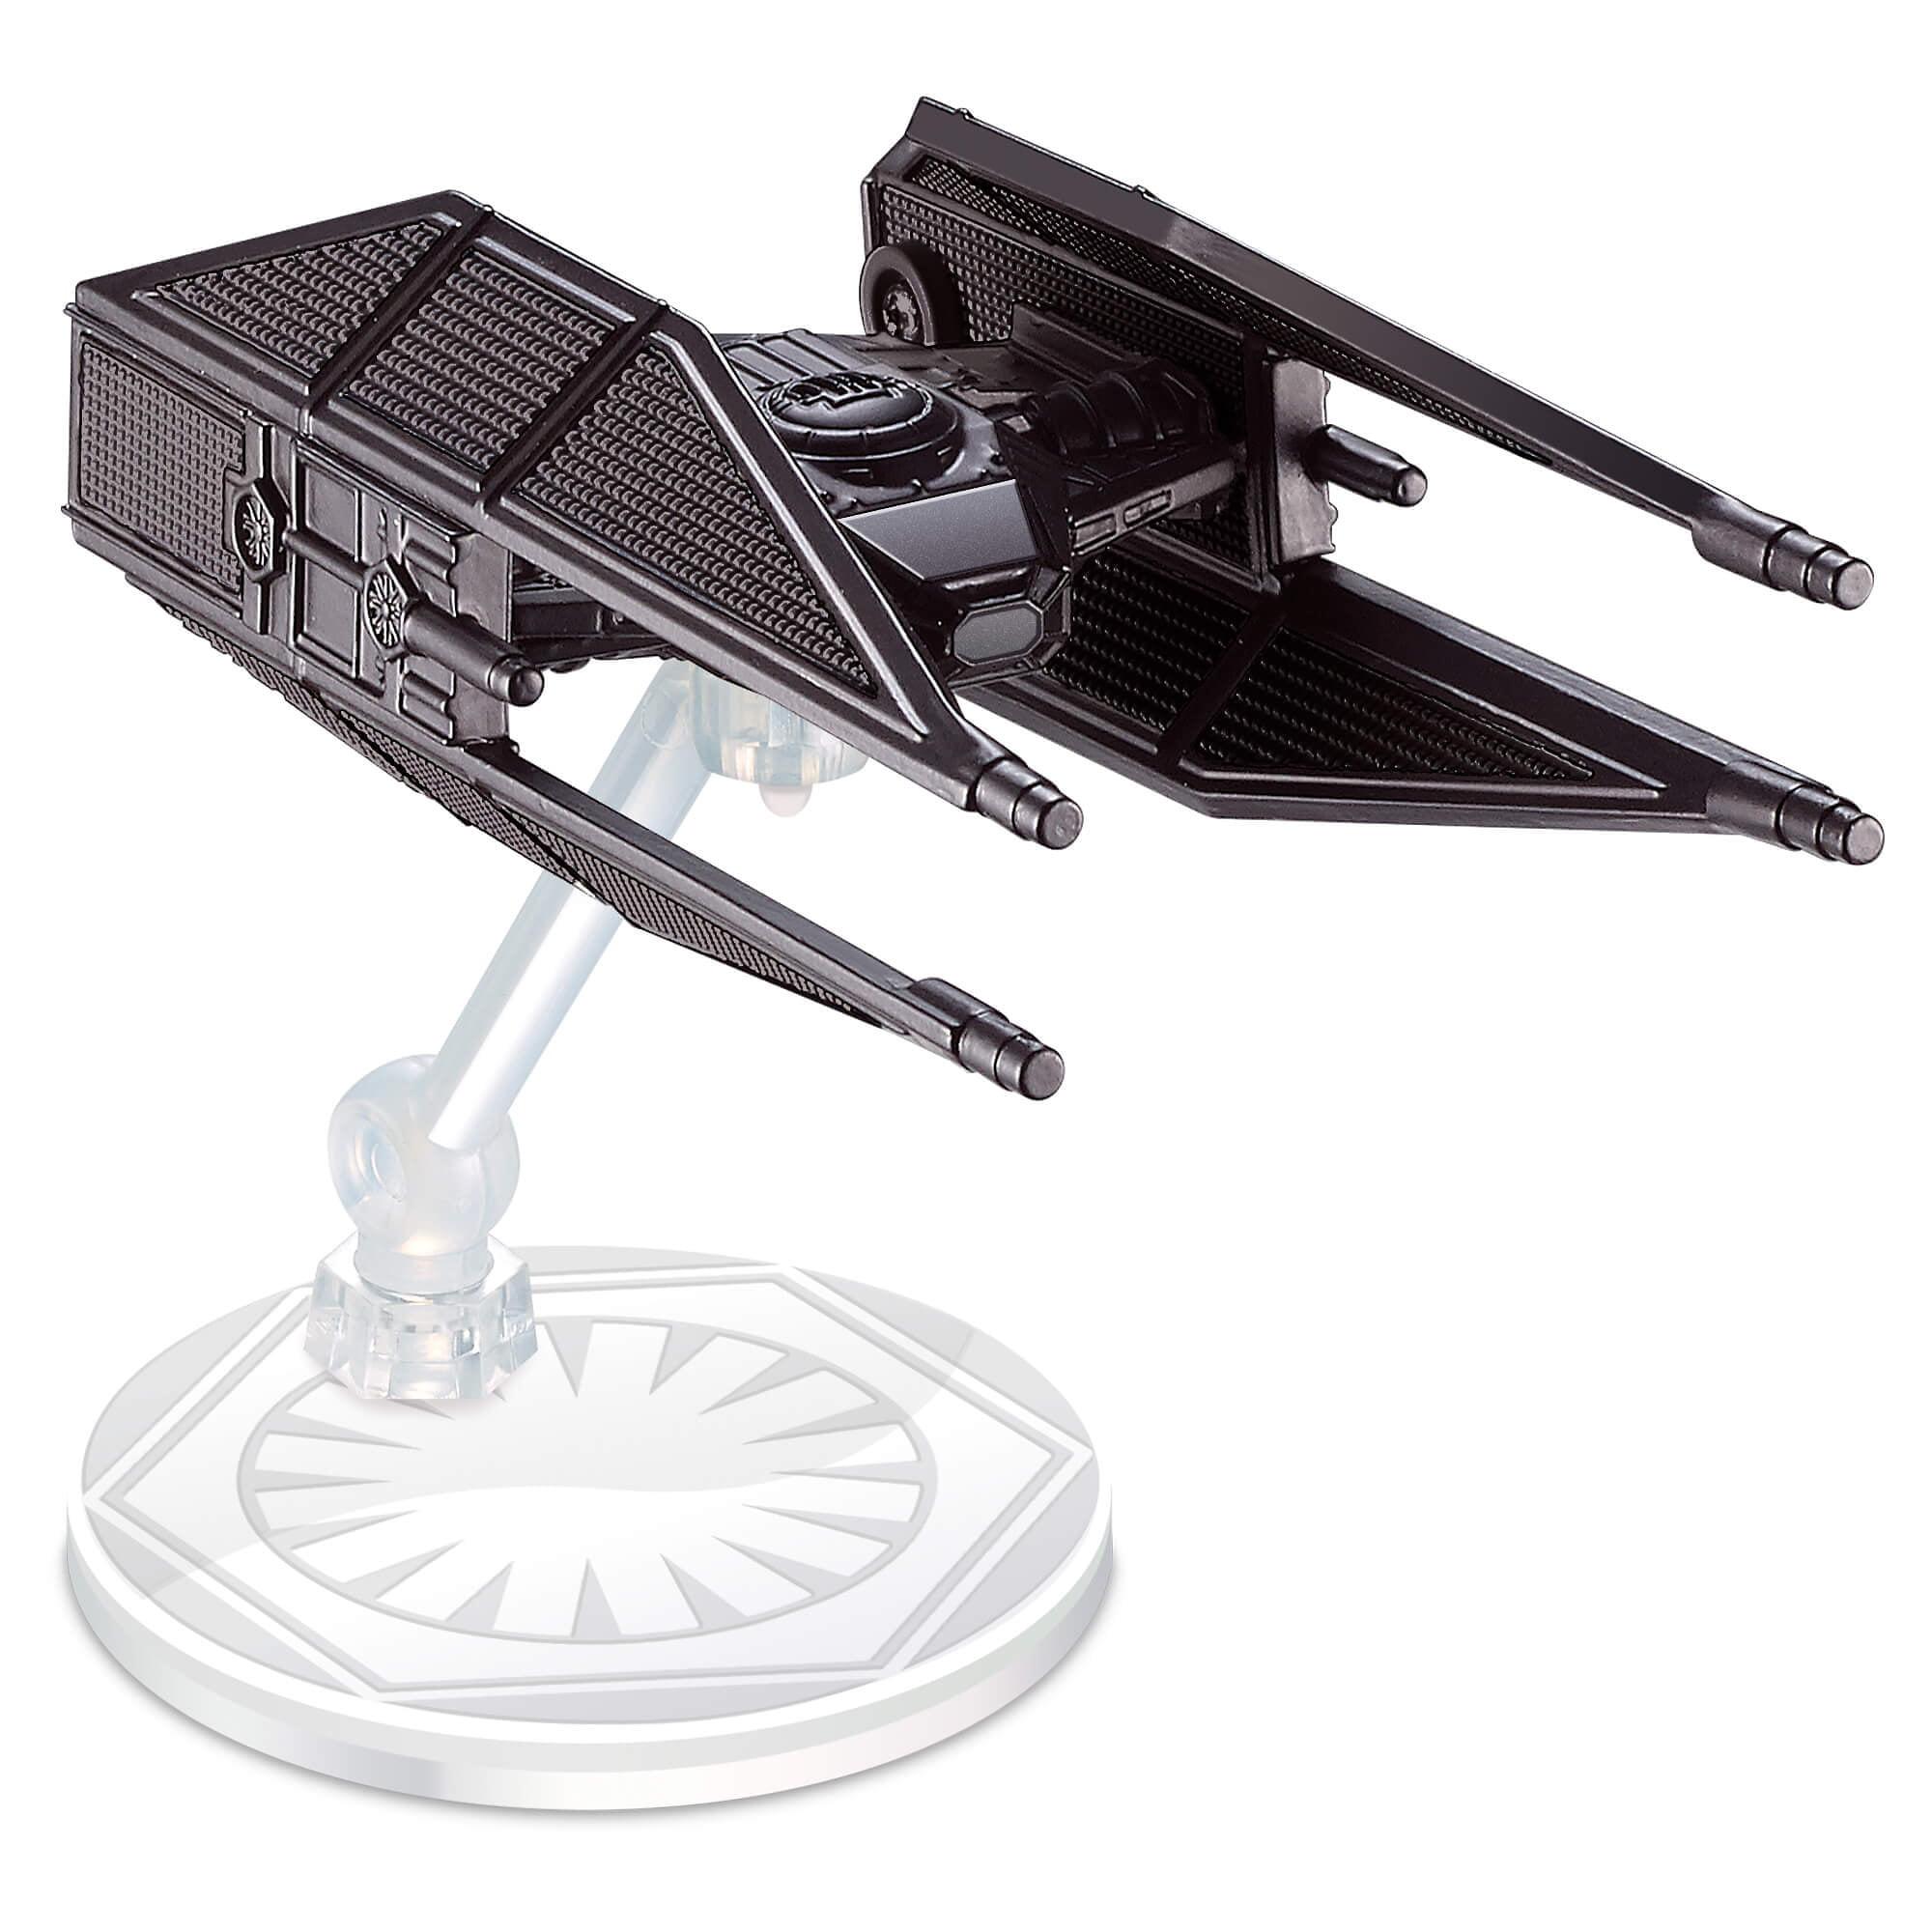 Hot Wheels Star Wars: The Last Jedi Kylo Ren's TIE Silencer, Starship by Mattel